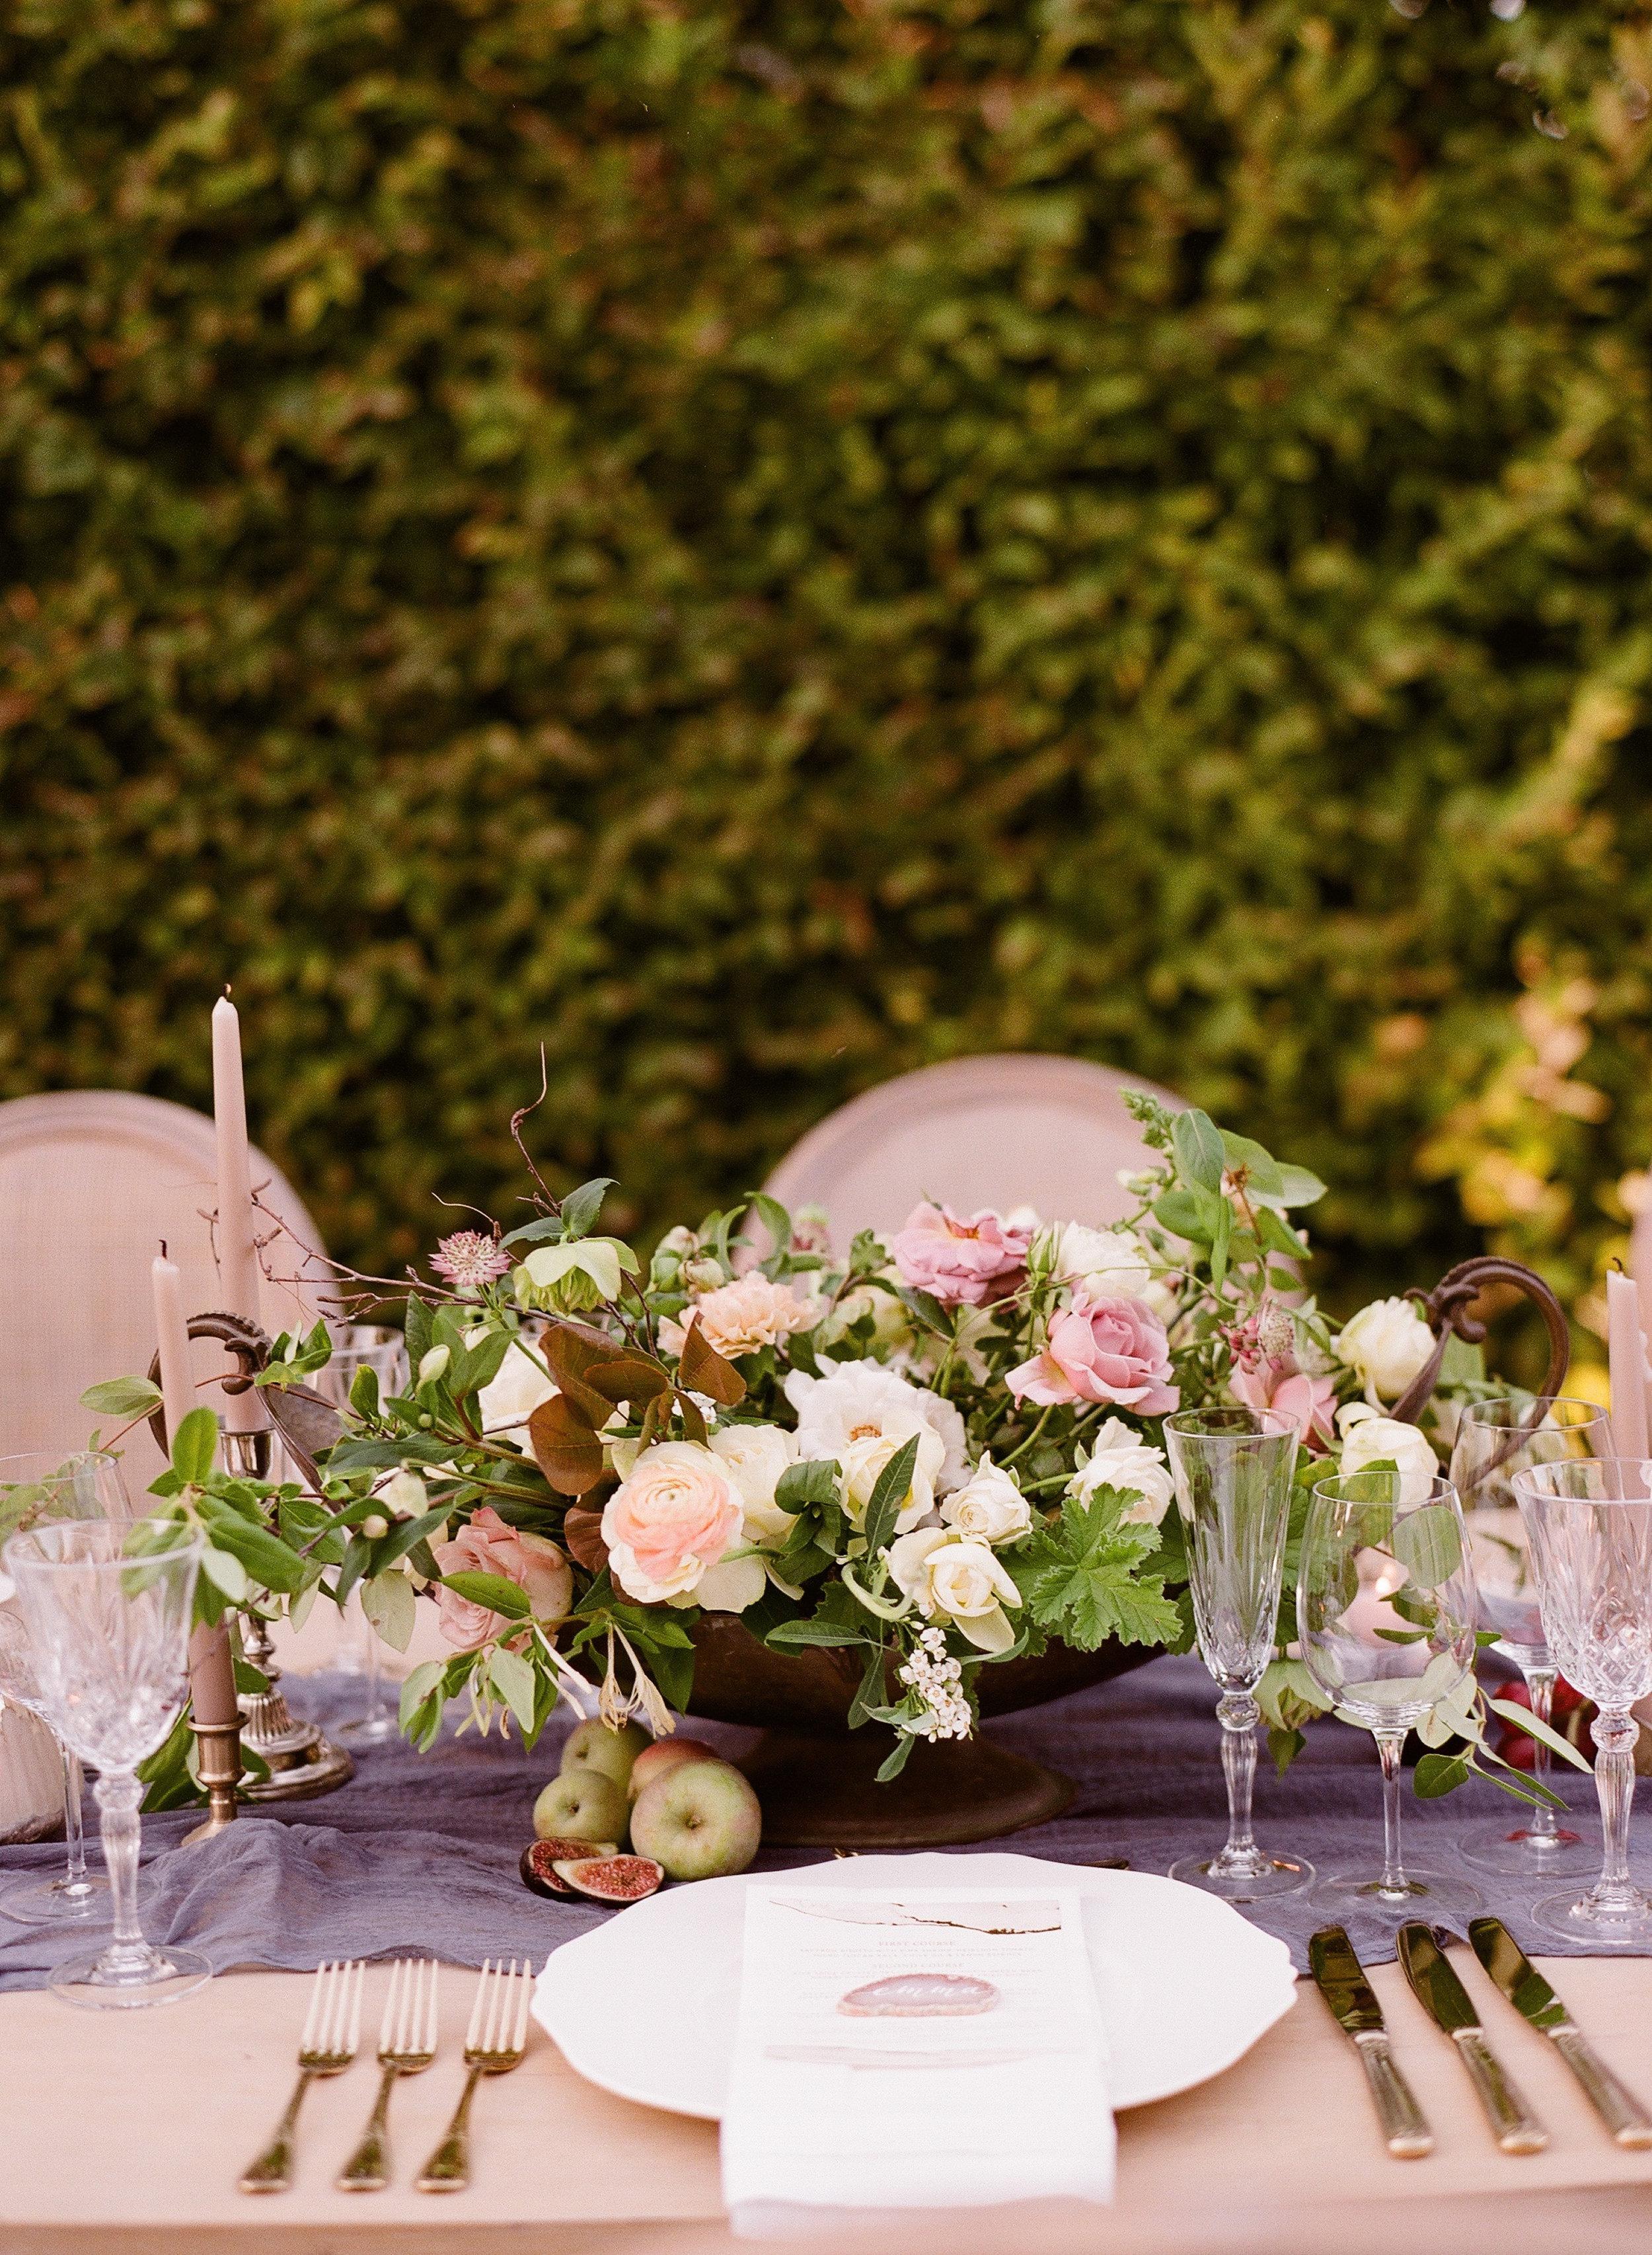 santa-barbara-elopement-elope-wedding-planner-planning-coordinator-day-of-intimate-event-design-kestrel-park-santa-ynez-english-country-estate-garden-castle (28).jpg